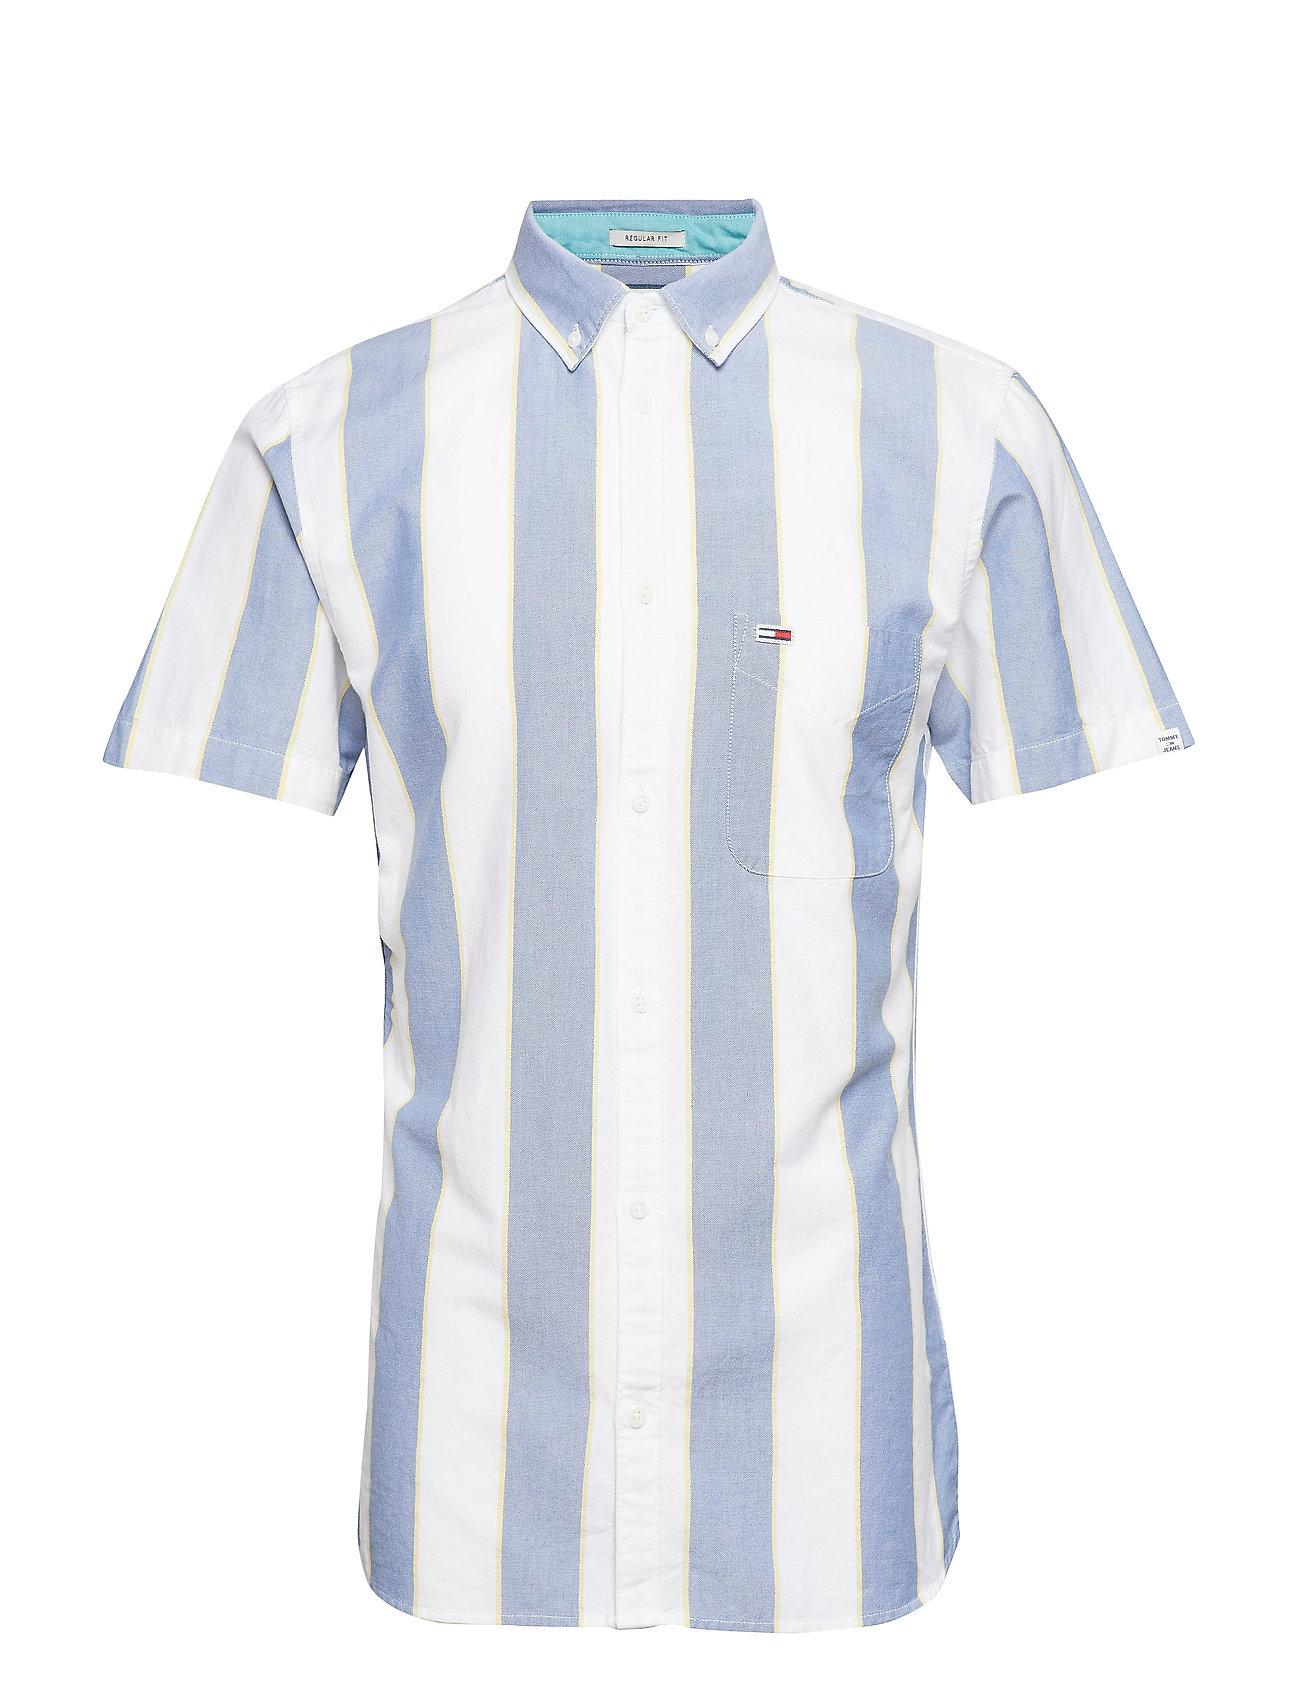 Tommy Jeans TJM STRIPED OXFORD S - FEDERAL BLUE / MULTI